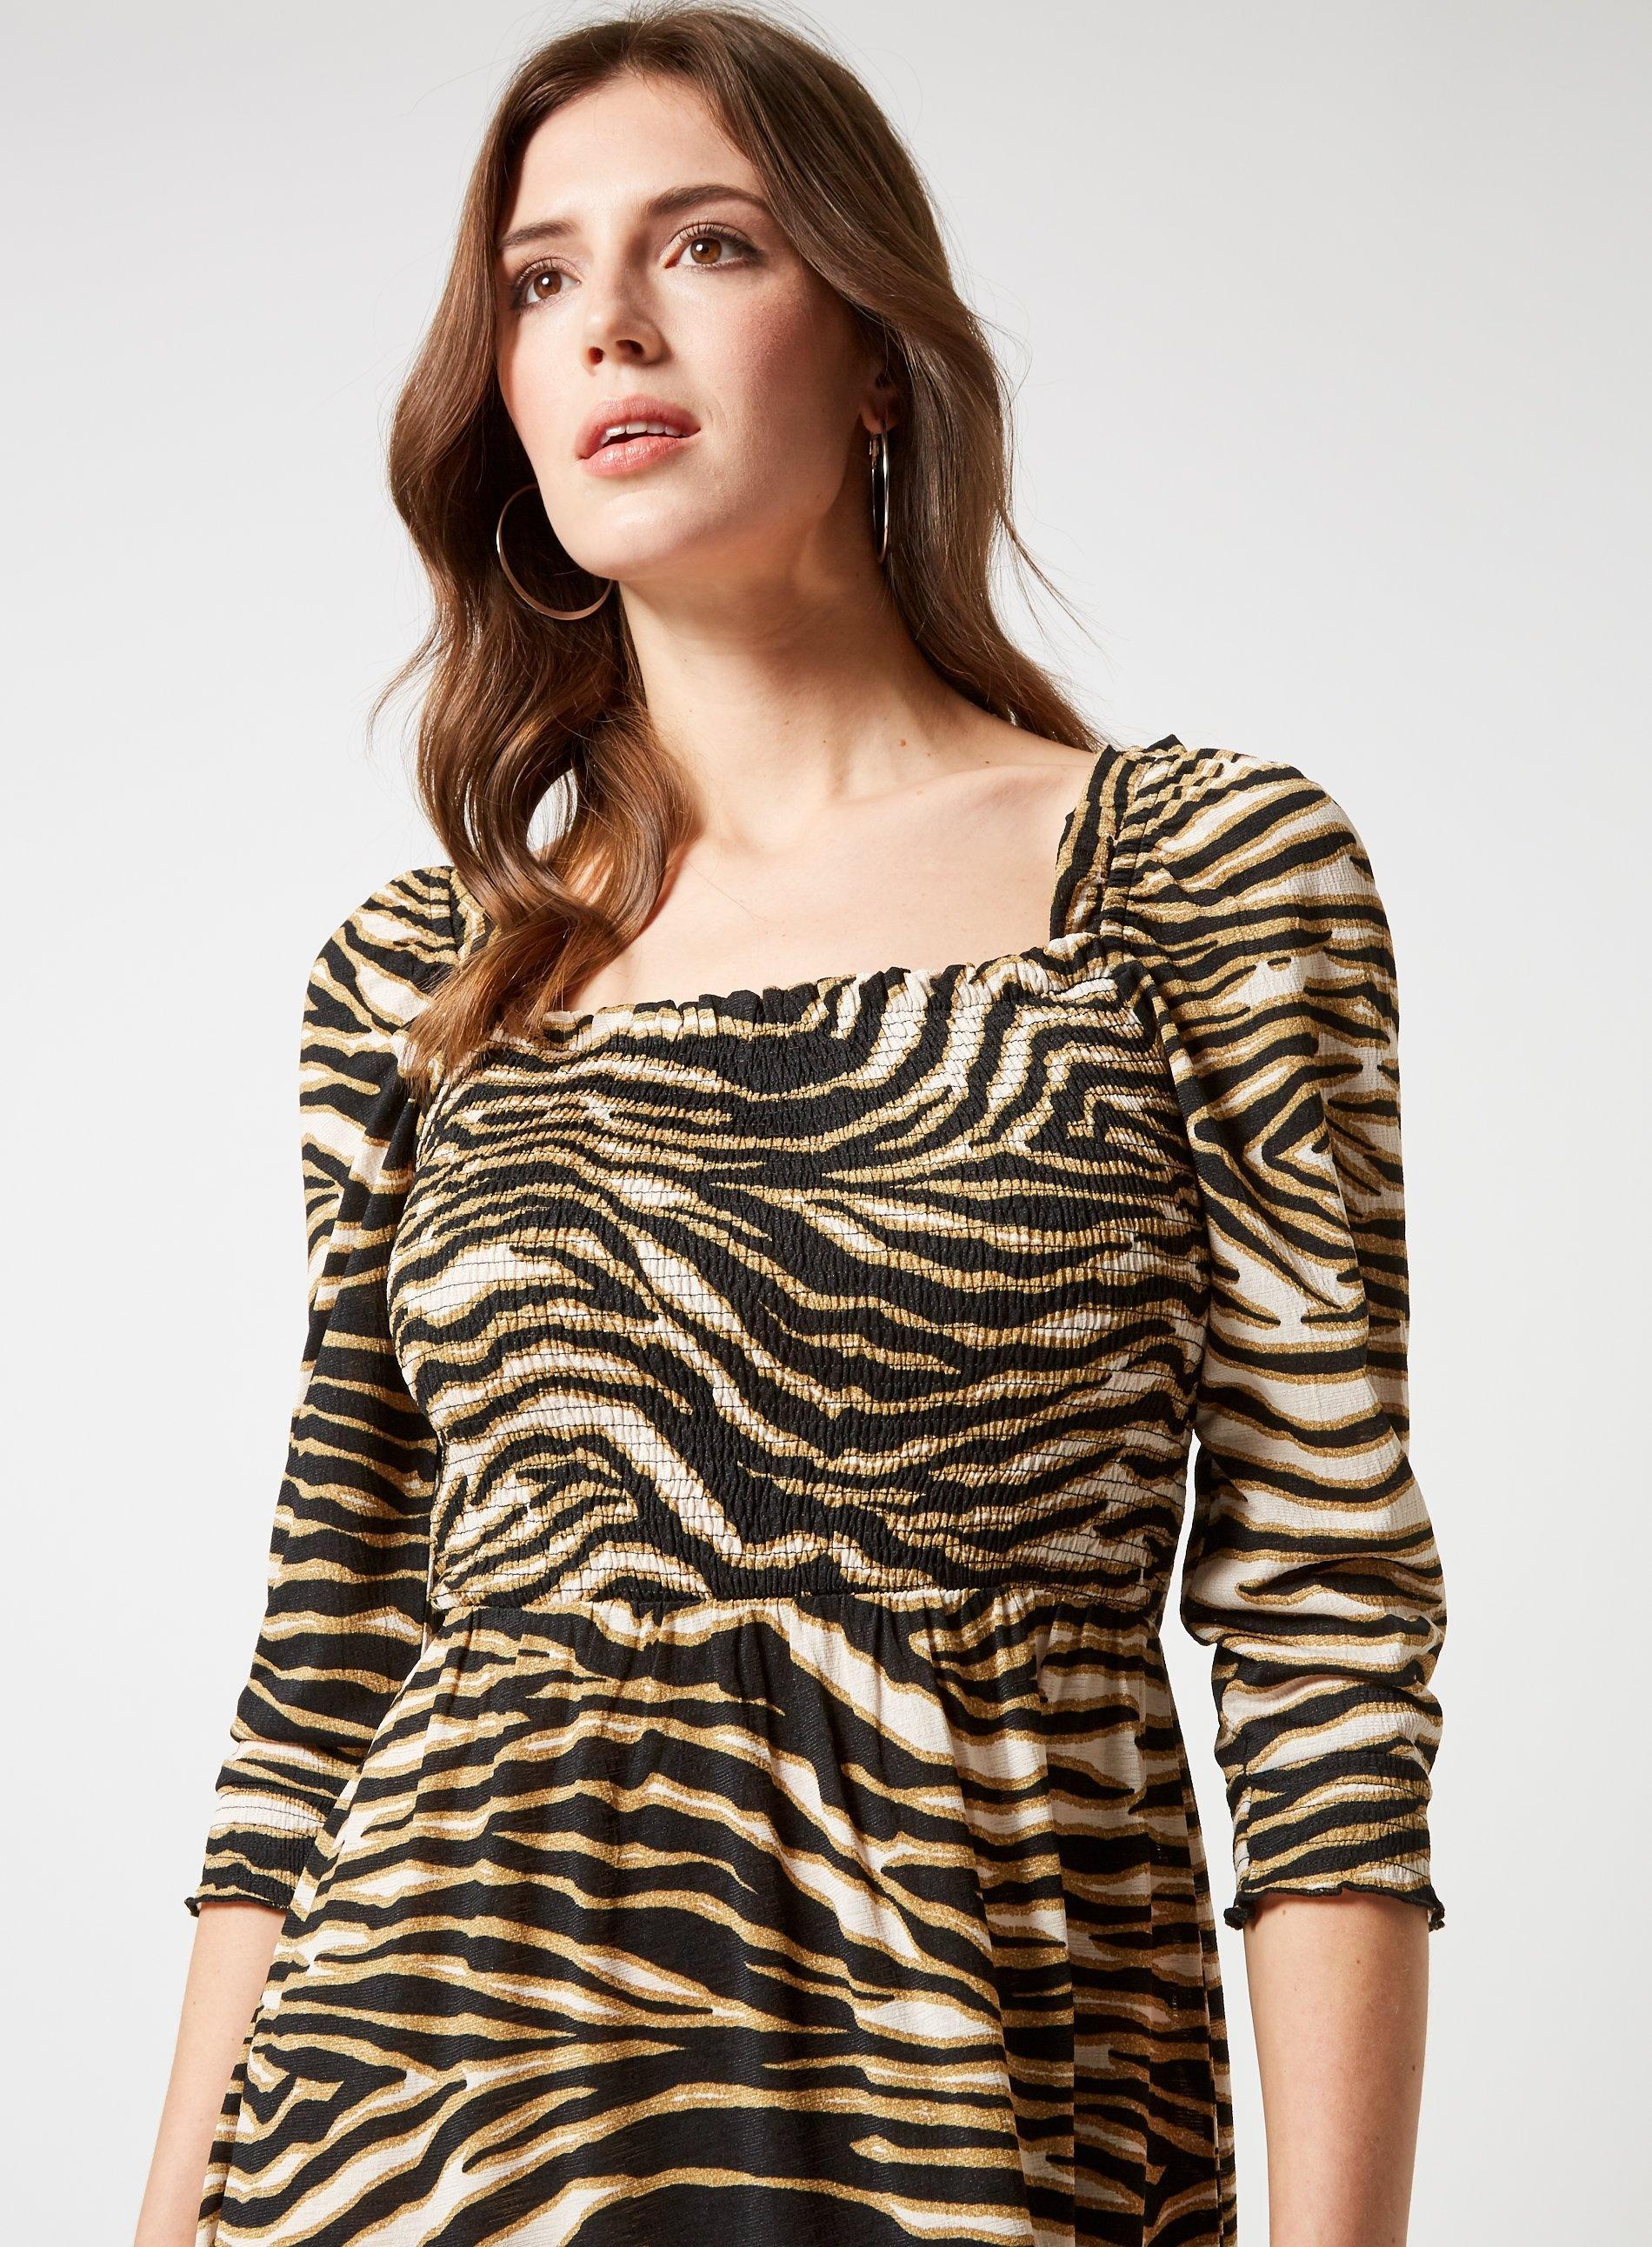 a175c2b2ca31d5 Lyst - Dorothy Perkins Multi Colour Cheetah Shirred Long Sleeves Midi  Skater Dress in Black